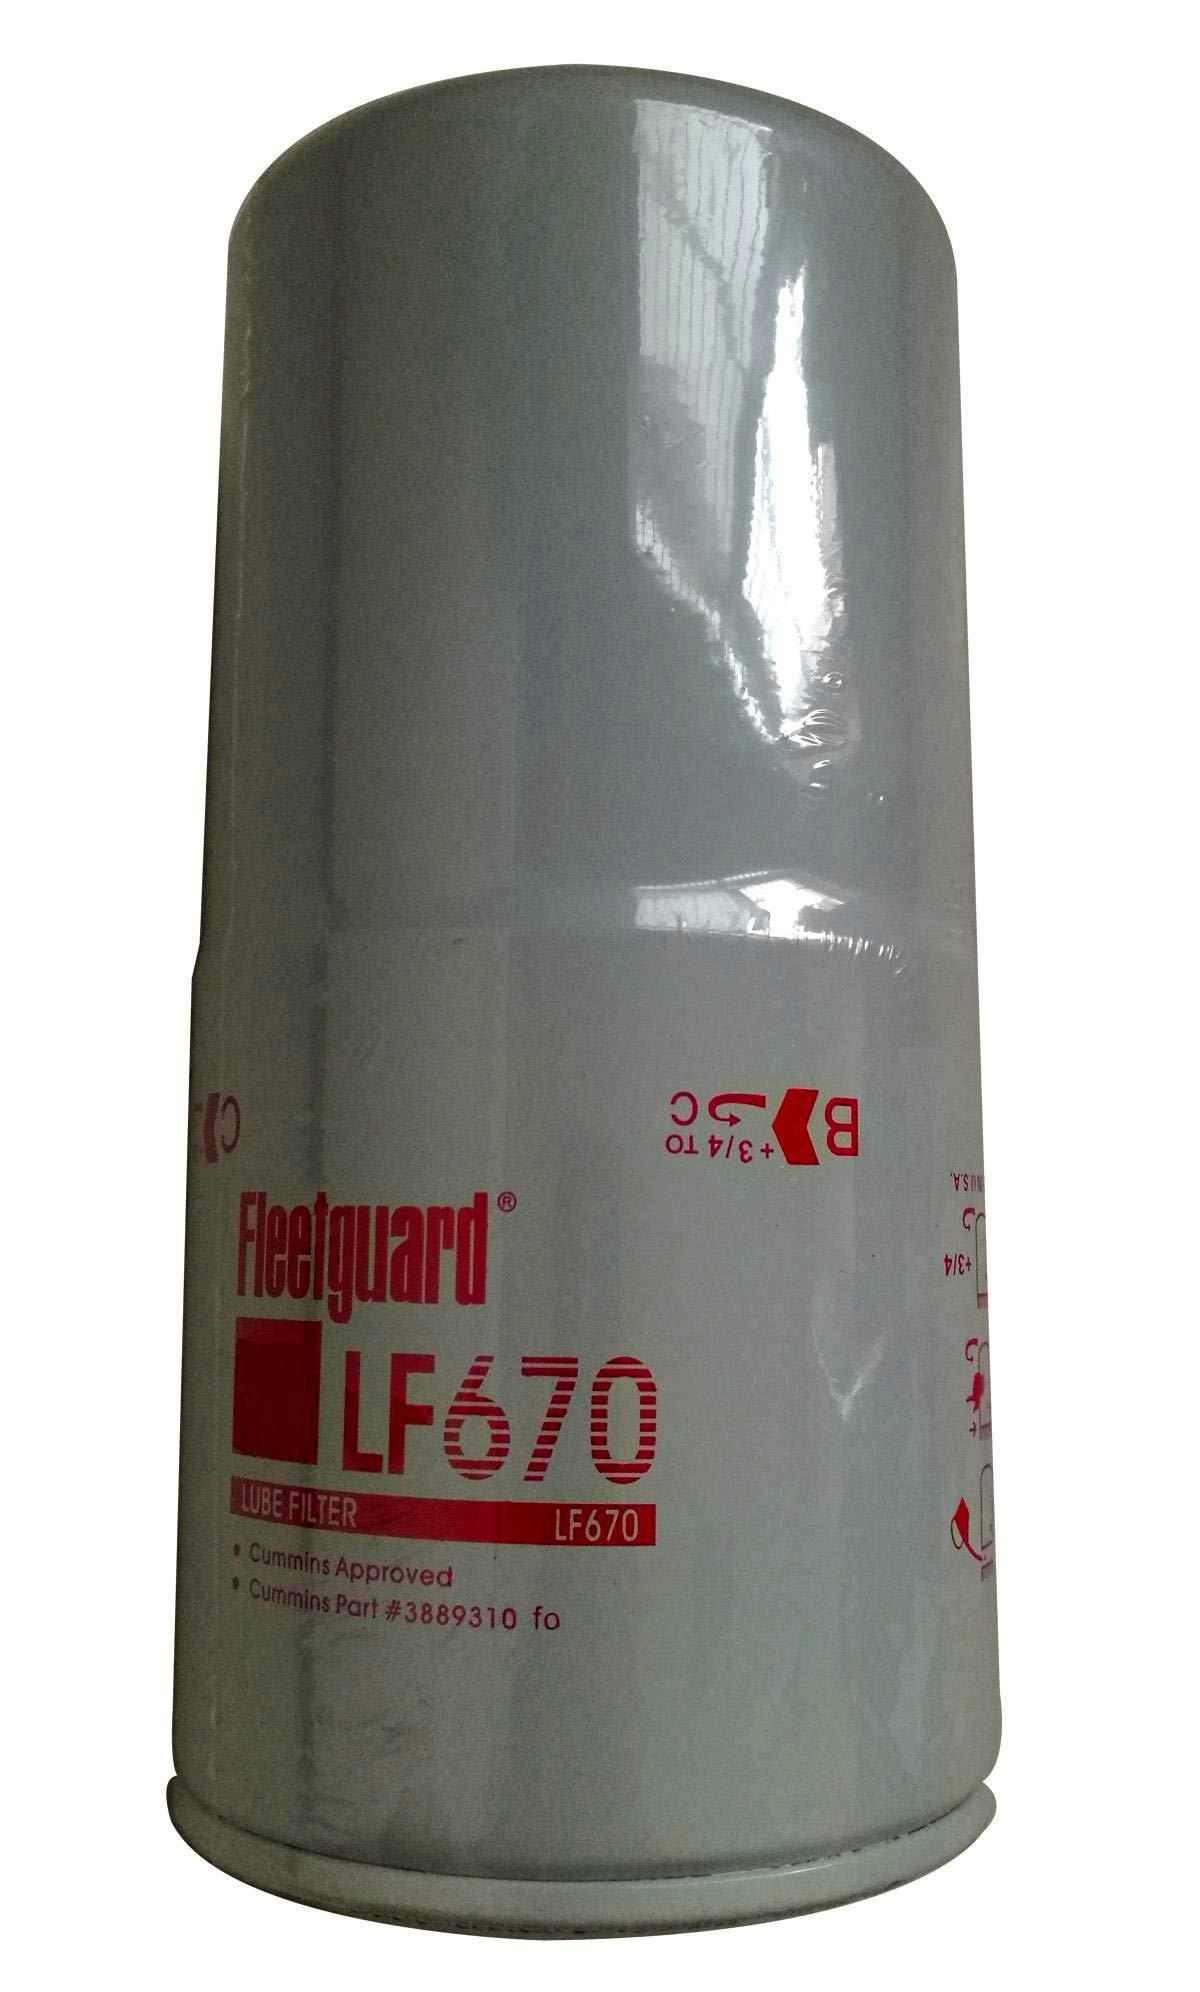 Fleetguard LF670 Oil Filter by Cummins Filtration